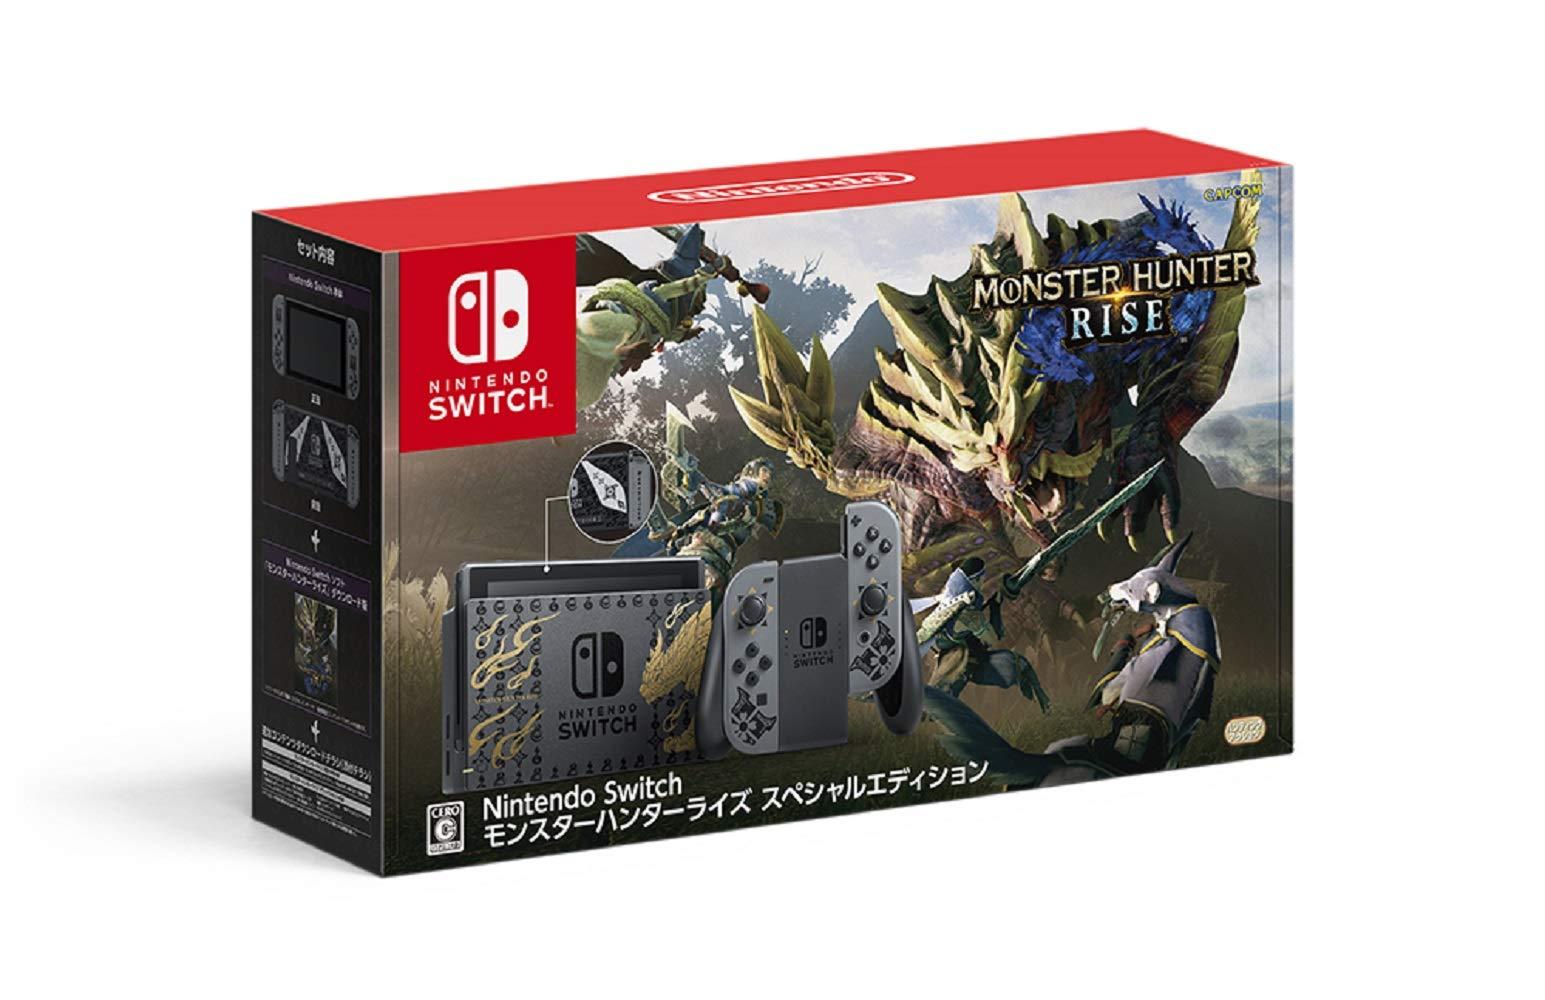 『Nintendo Switch モンスターハンターライズ スペシャルエディション』の抽選販売!【ノジマオンライン】